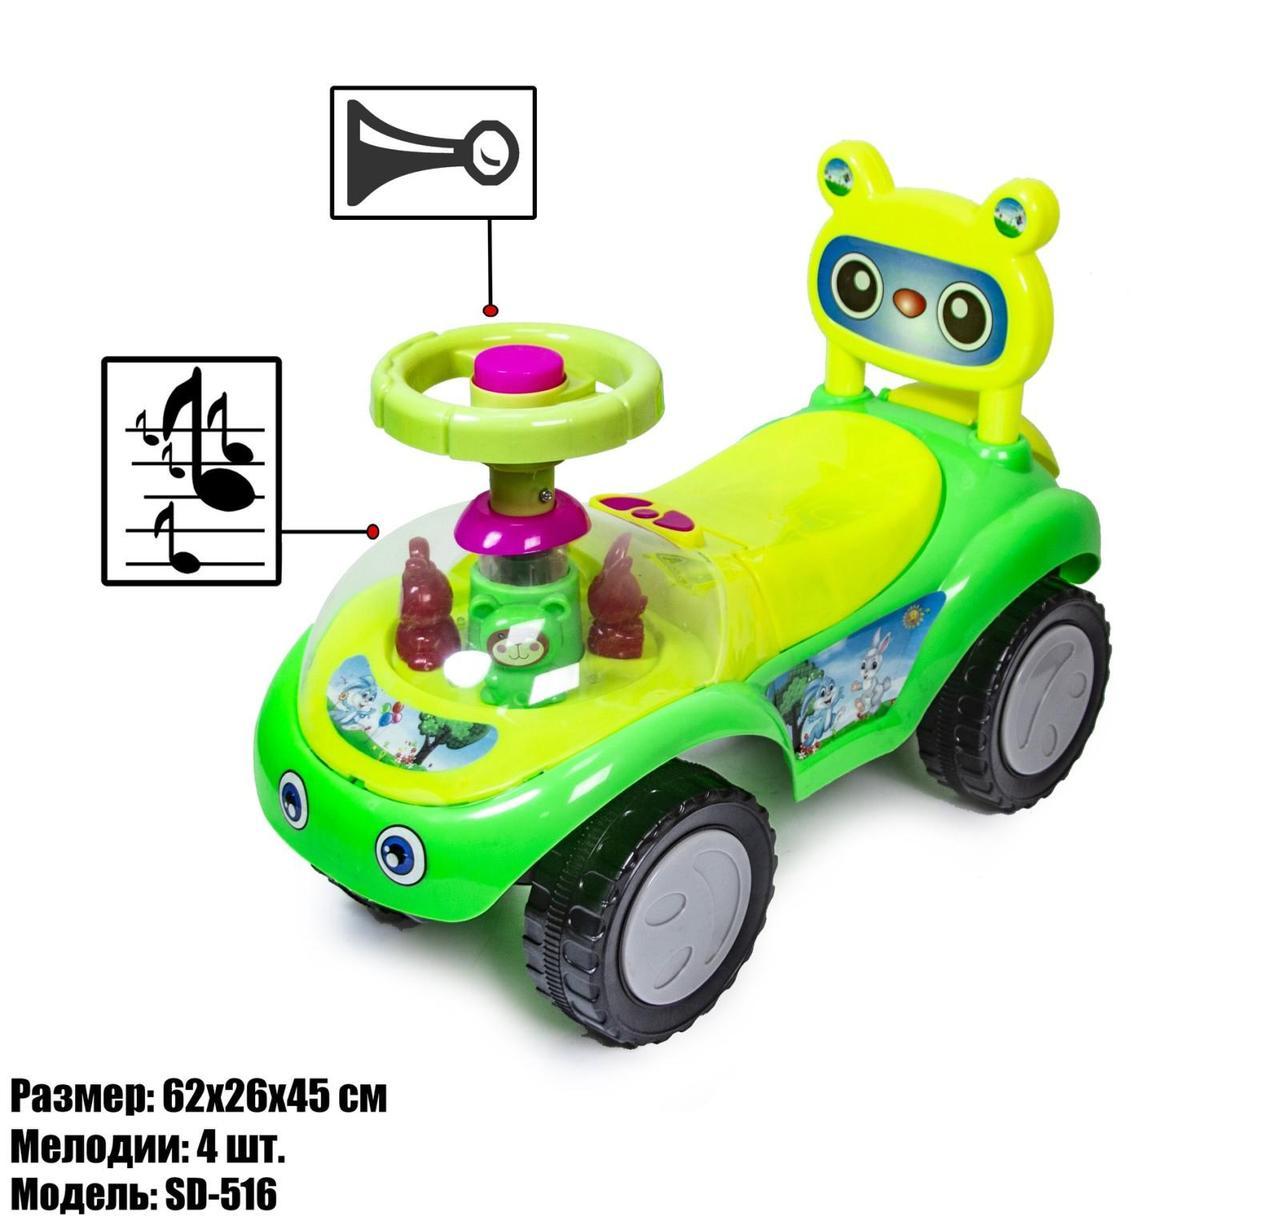 Машинка каталка толокар ЗАЙЦЫ 516 зеленый